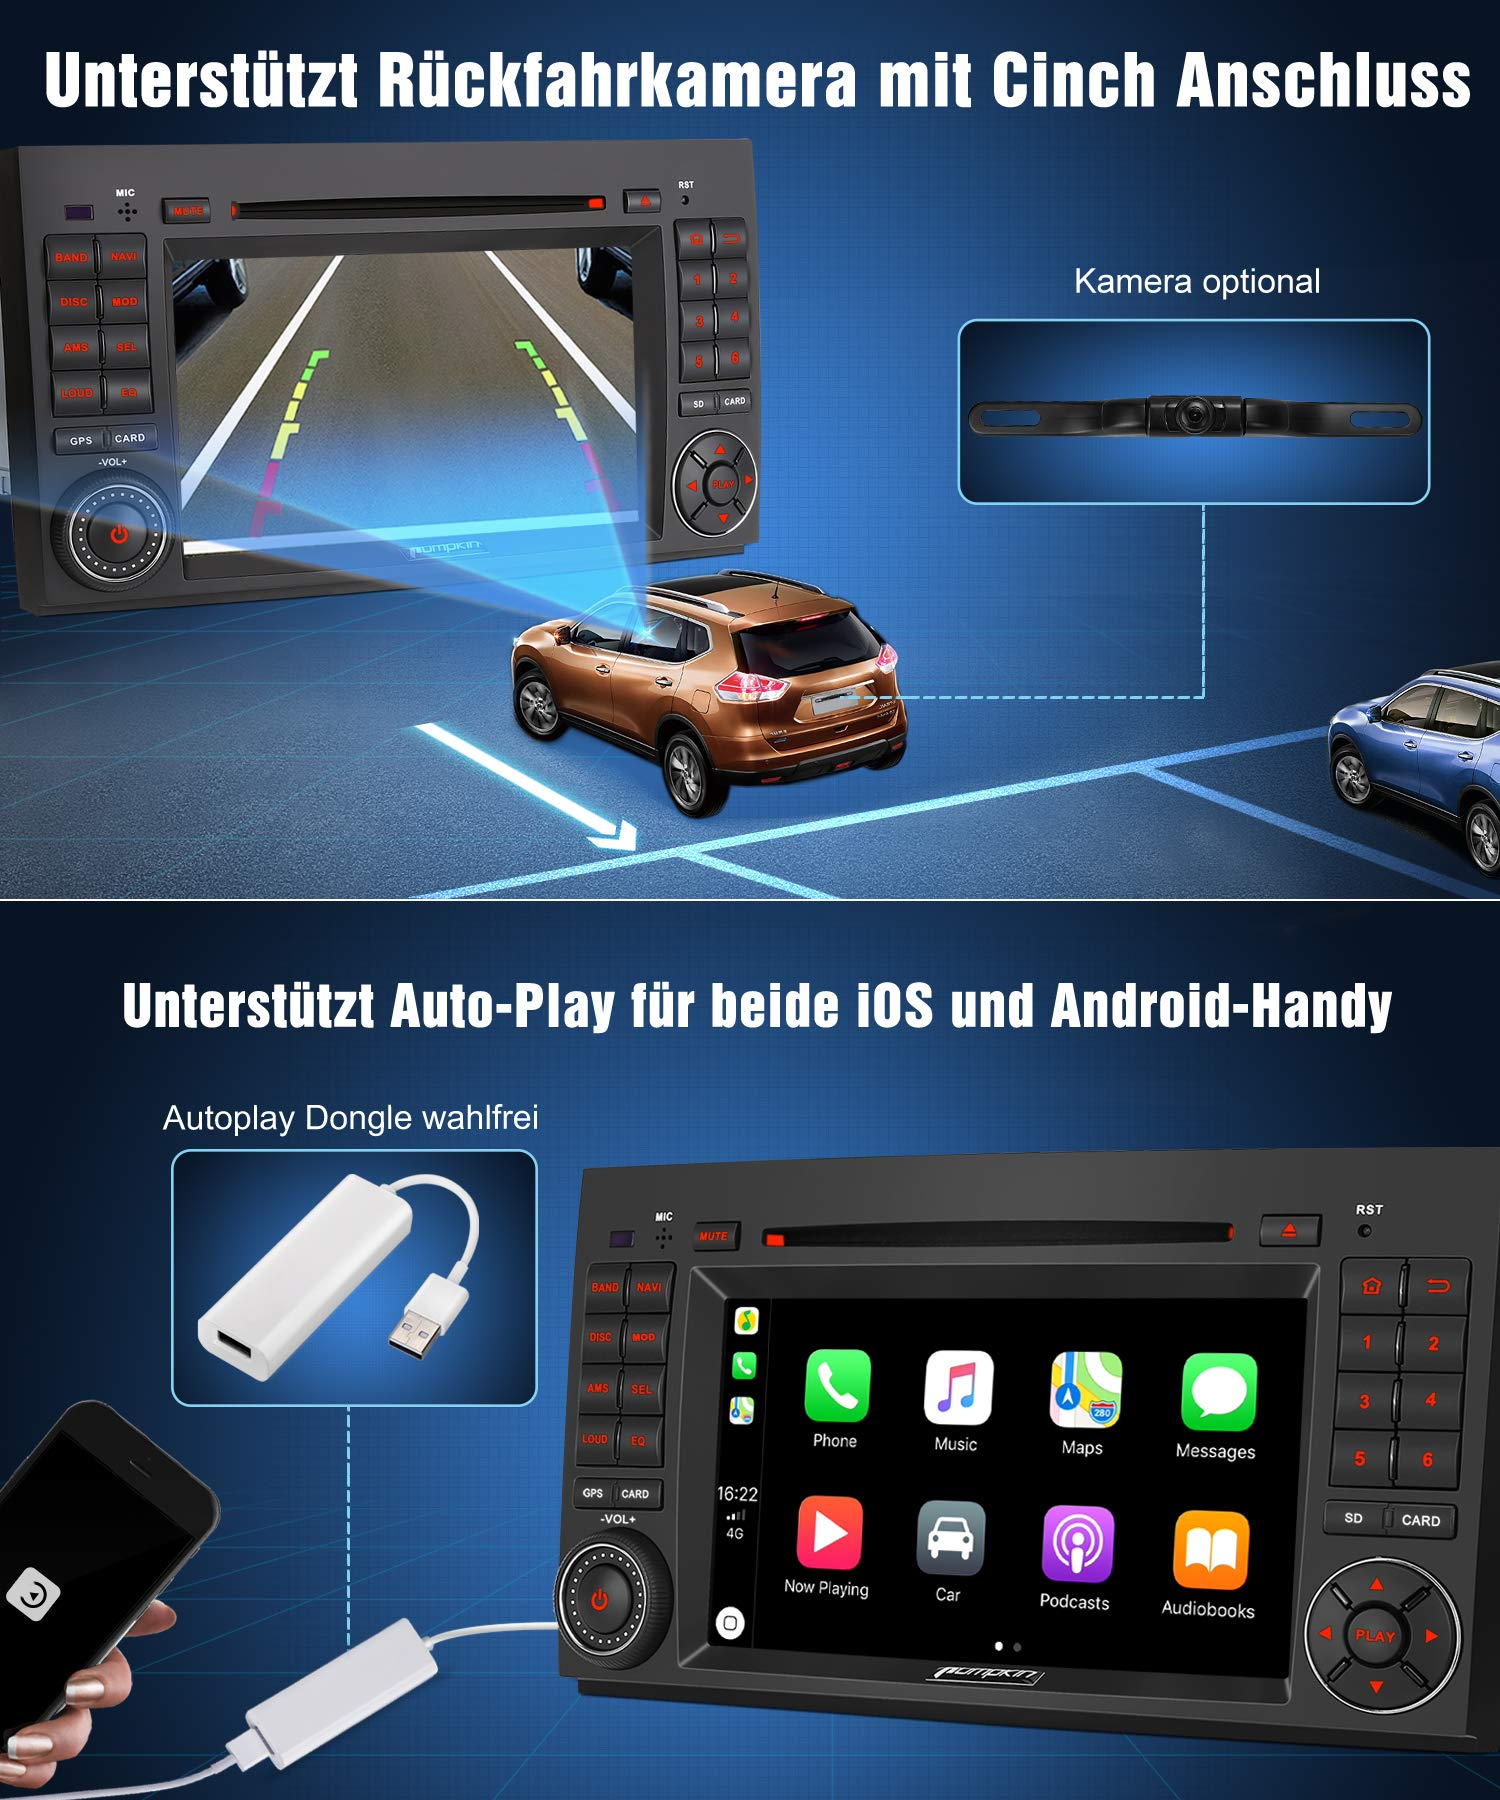 Pumpkin-Android-80-Autoradio-Radio-fr-Mercedes-Benz-A-KlasseB-KlasseVito-mit-Navi-Untersttzt-Bluetooth-DAB-USB-CD-DVD-Android-Auto-WLAN-4G-MicroSD-2-Din-7-Zoll-Bildschirm